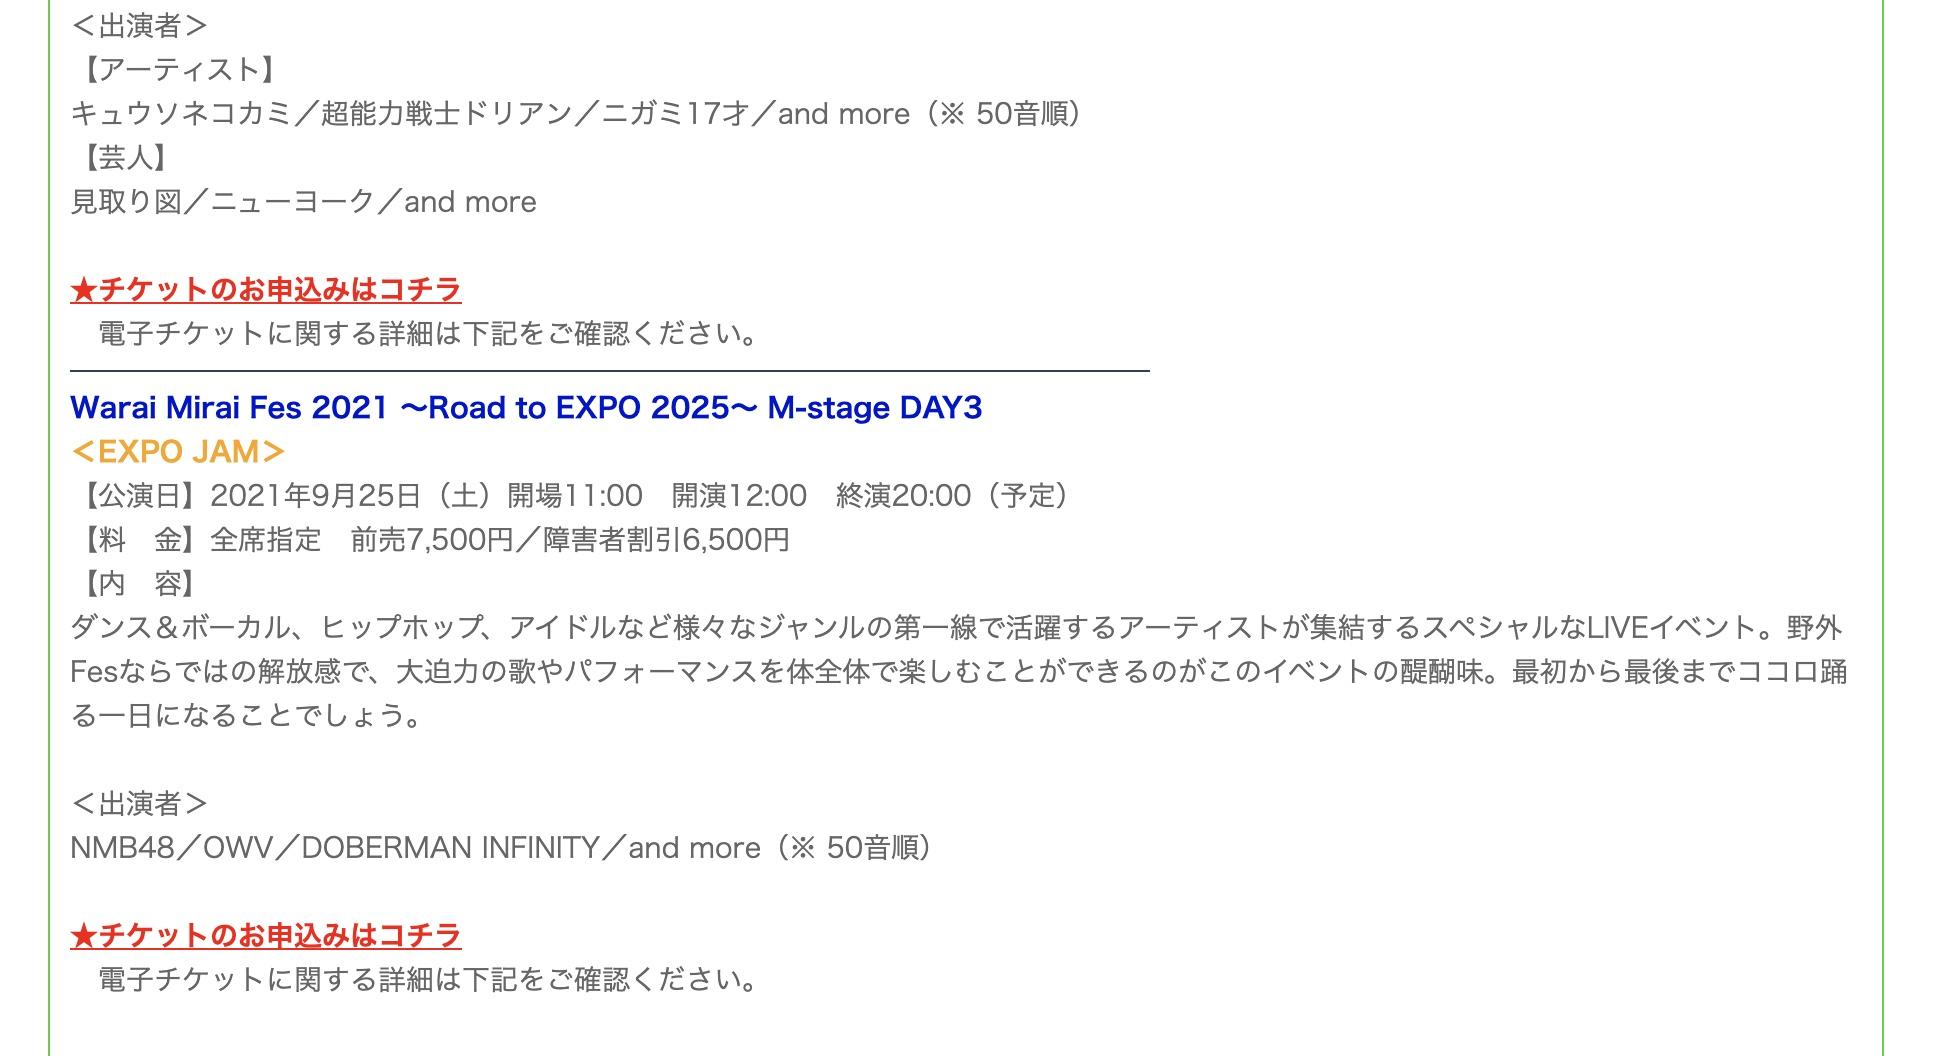 【NMB48】Warai Mirai Fes 2021 ~Road to EXPO 2025~M-stage DAY3に出演